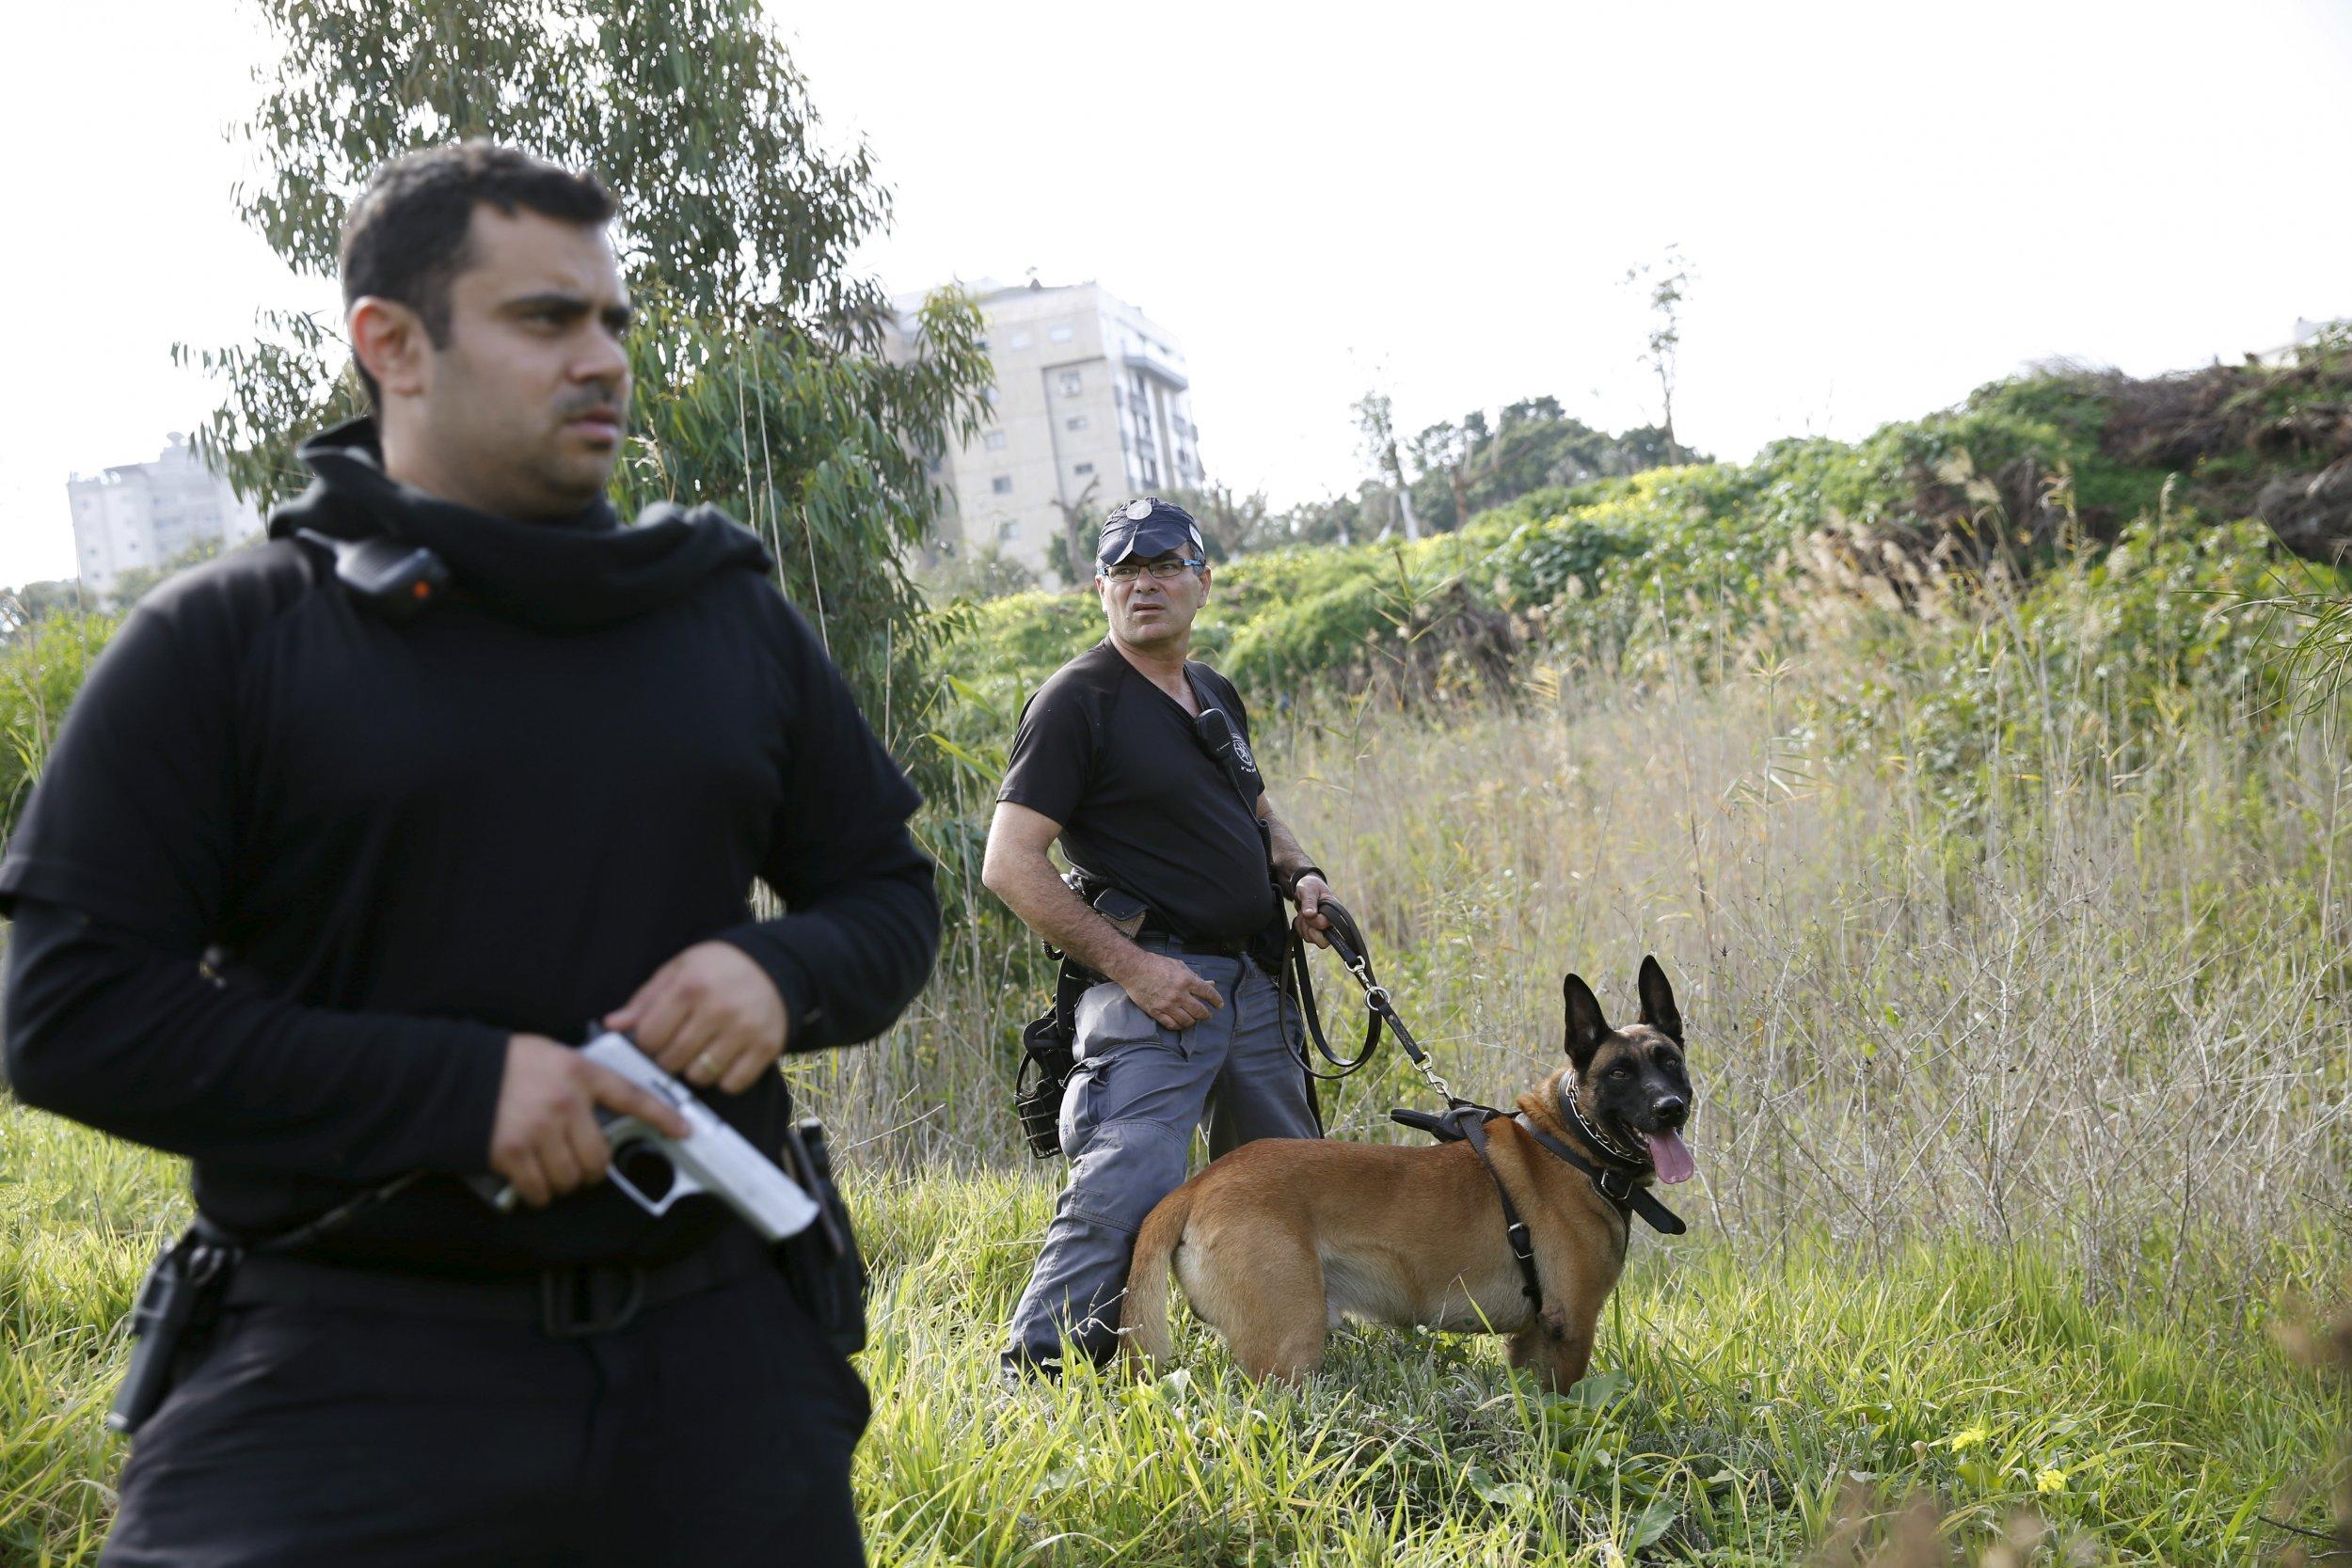 01_04_Tel_Aviv_01